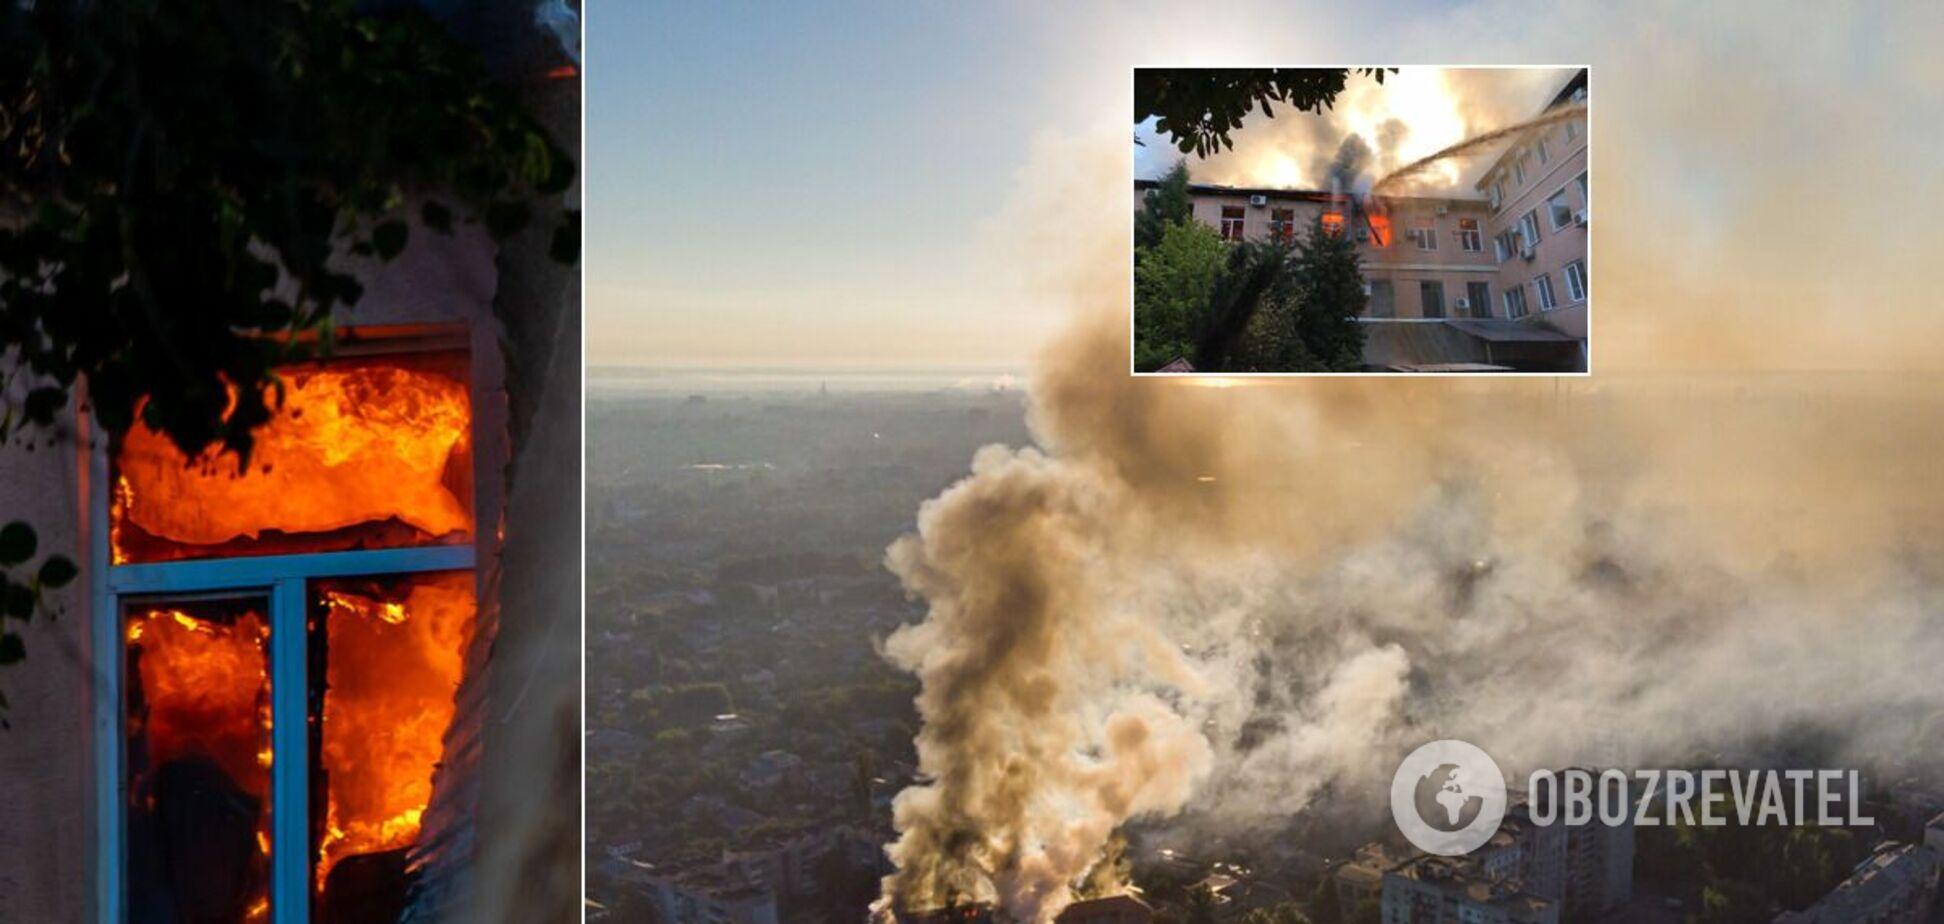 У Дніпрі трапилася масштабна пожежа: над містом стояв стовп диму. Фото